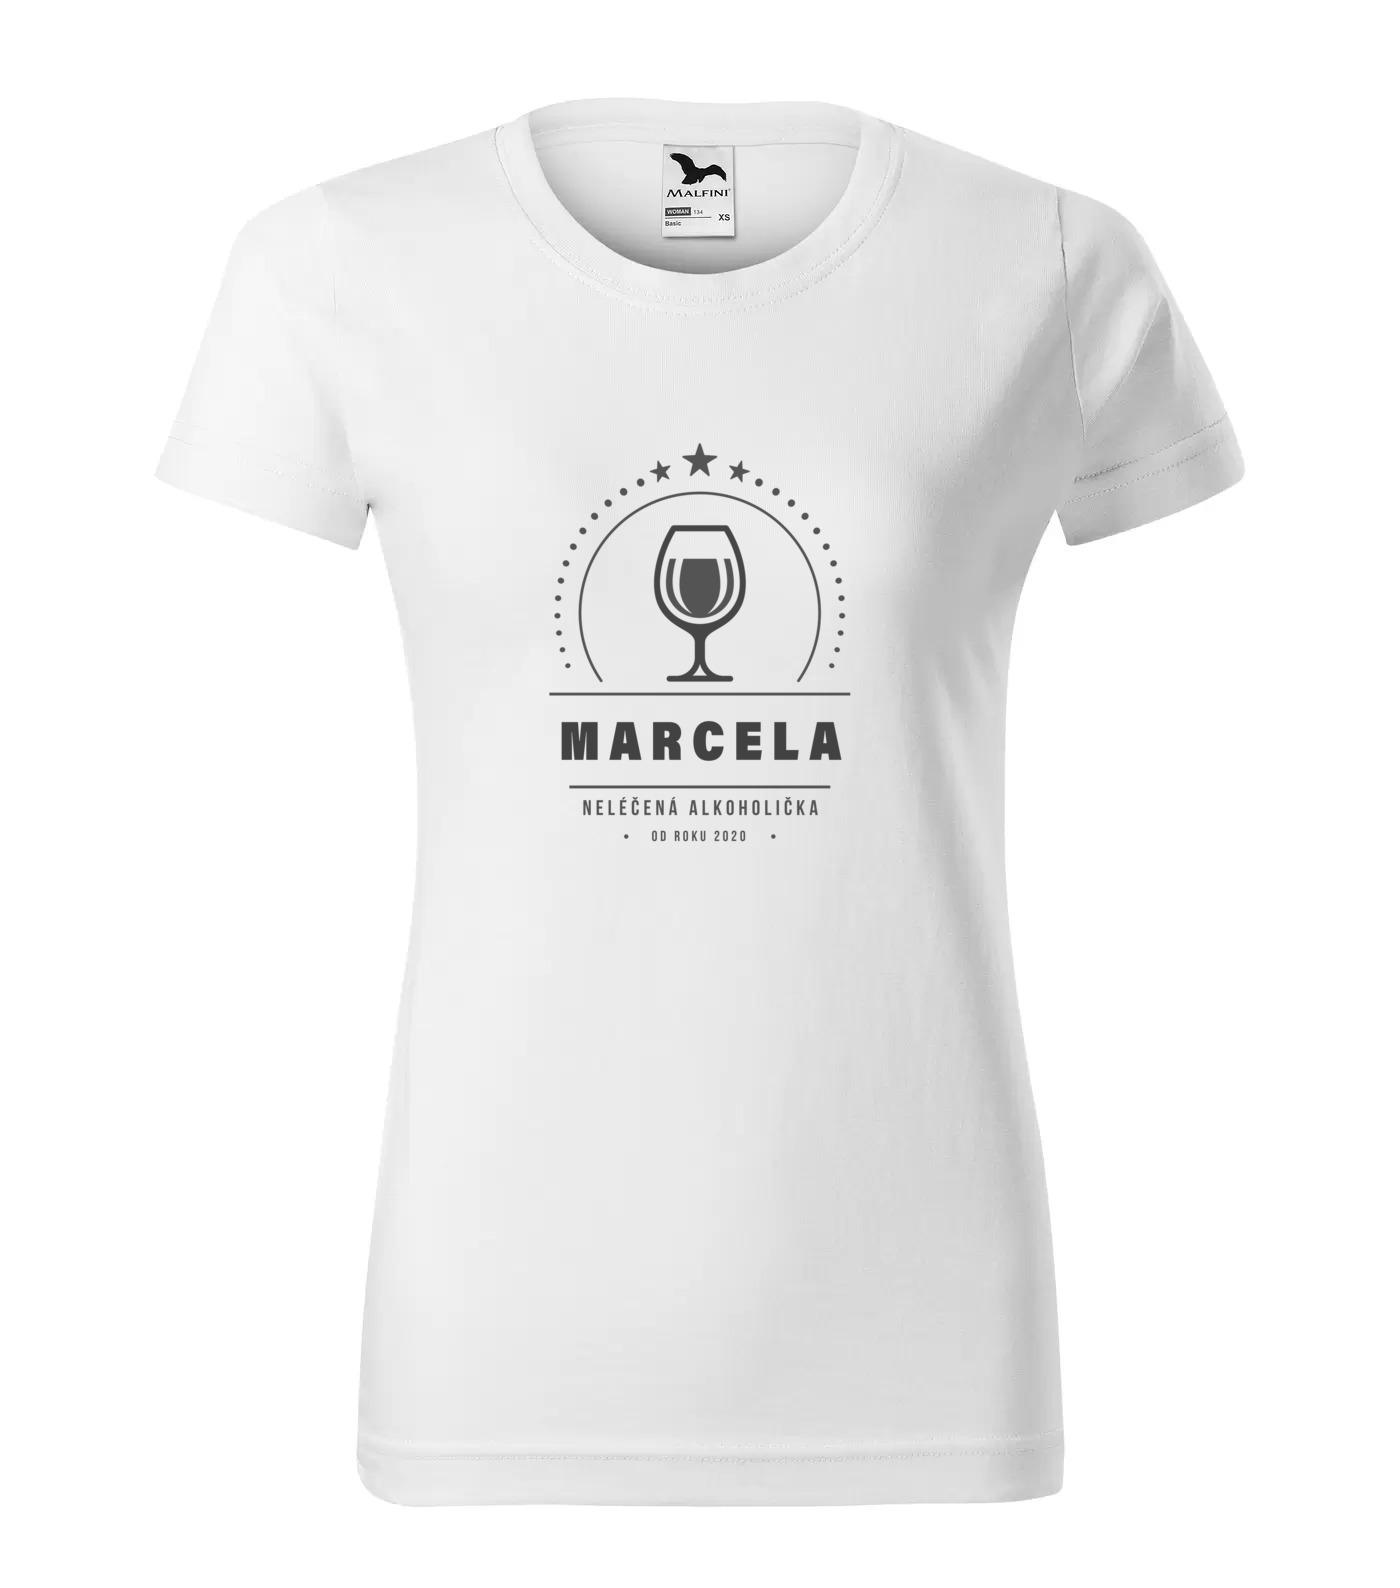 Tričko Alkoholička Marcela